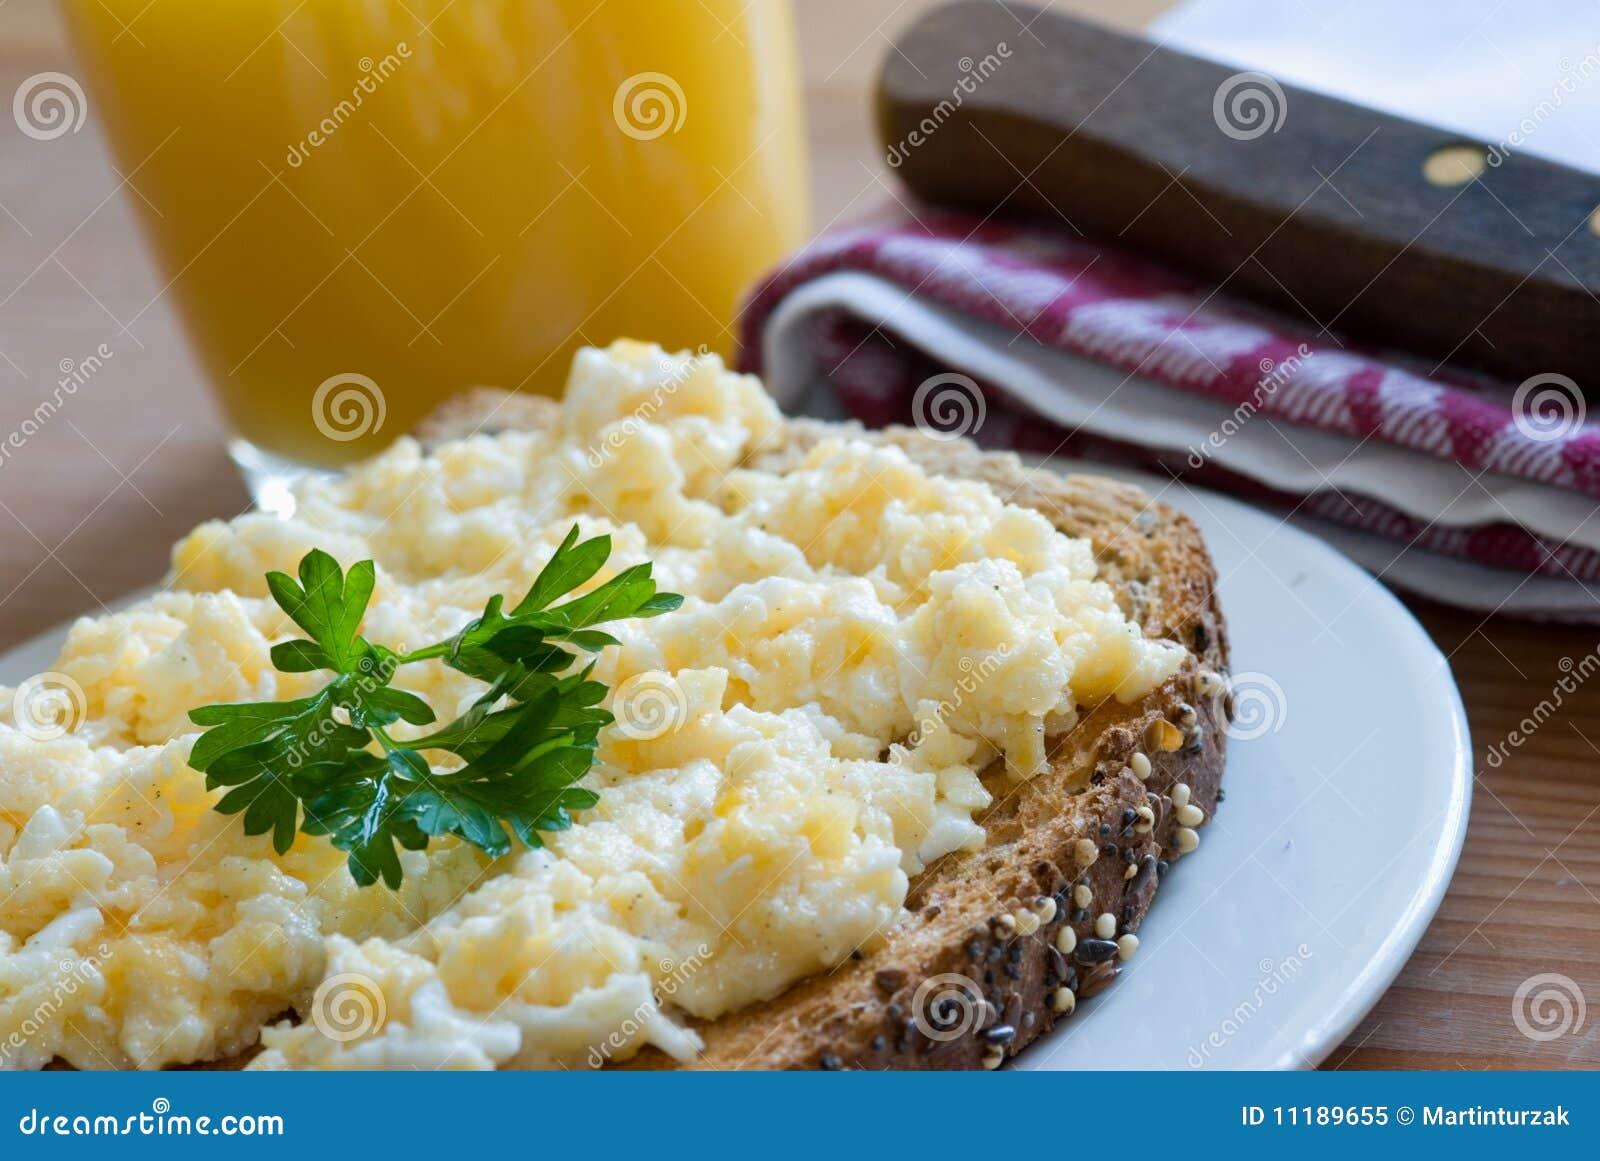 Toast With Scrambled Egg Royalty Free Stock Photo - Image: 11189655